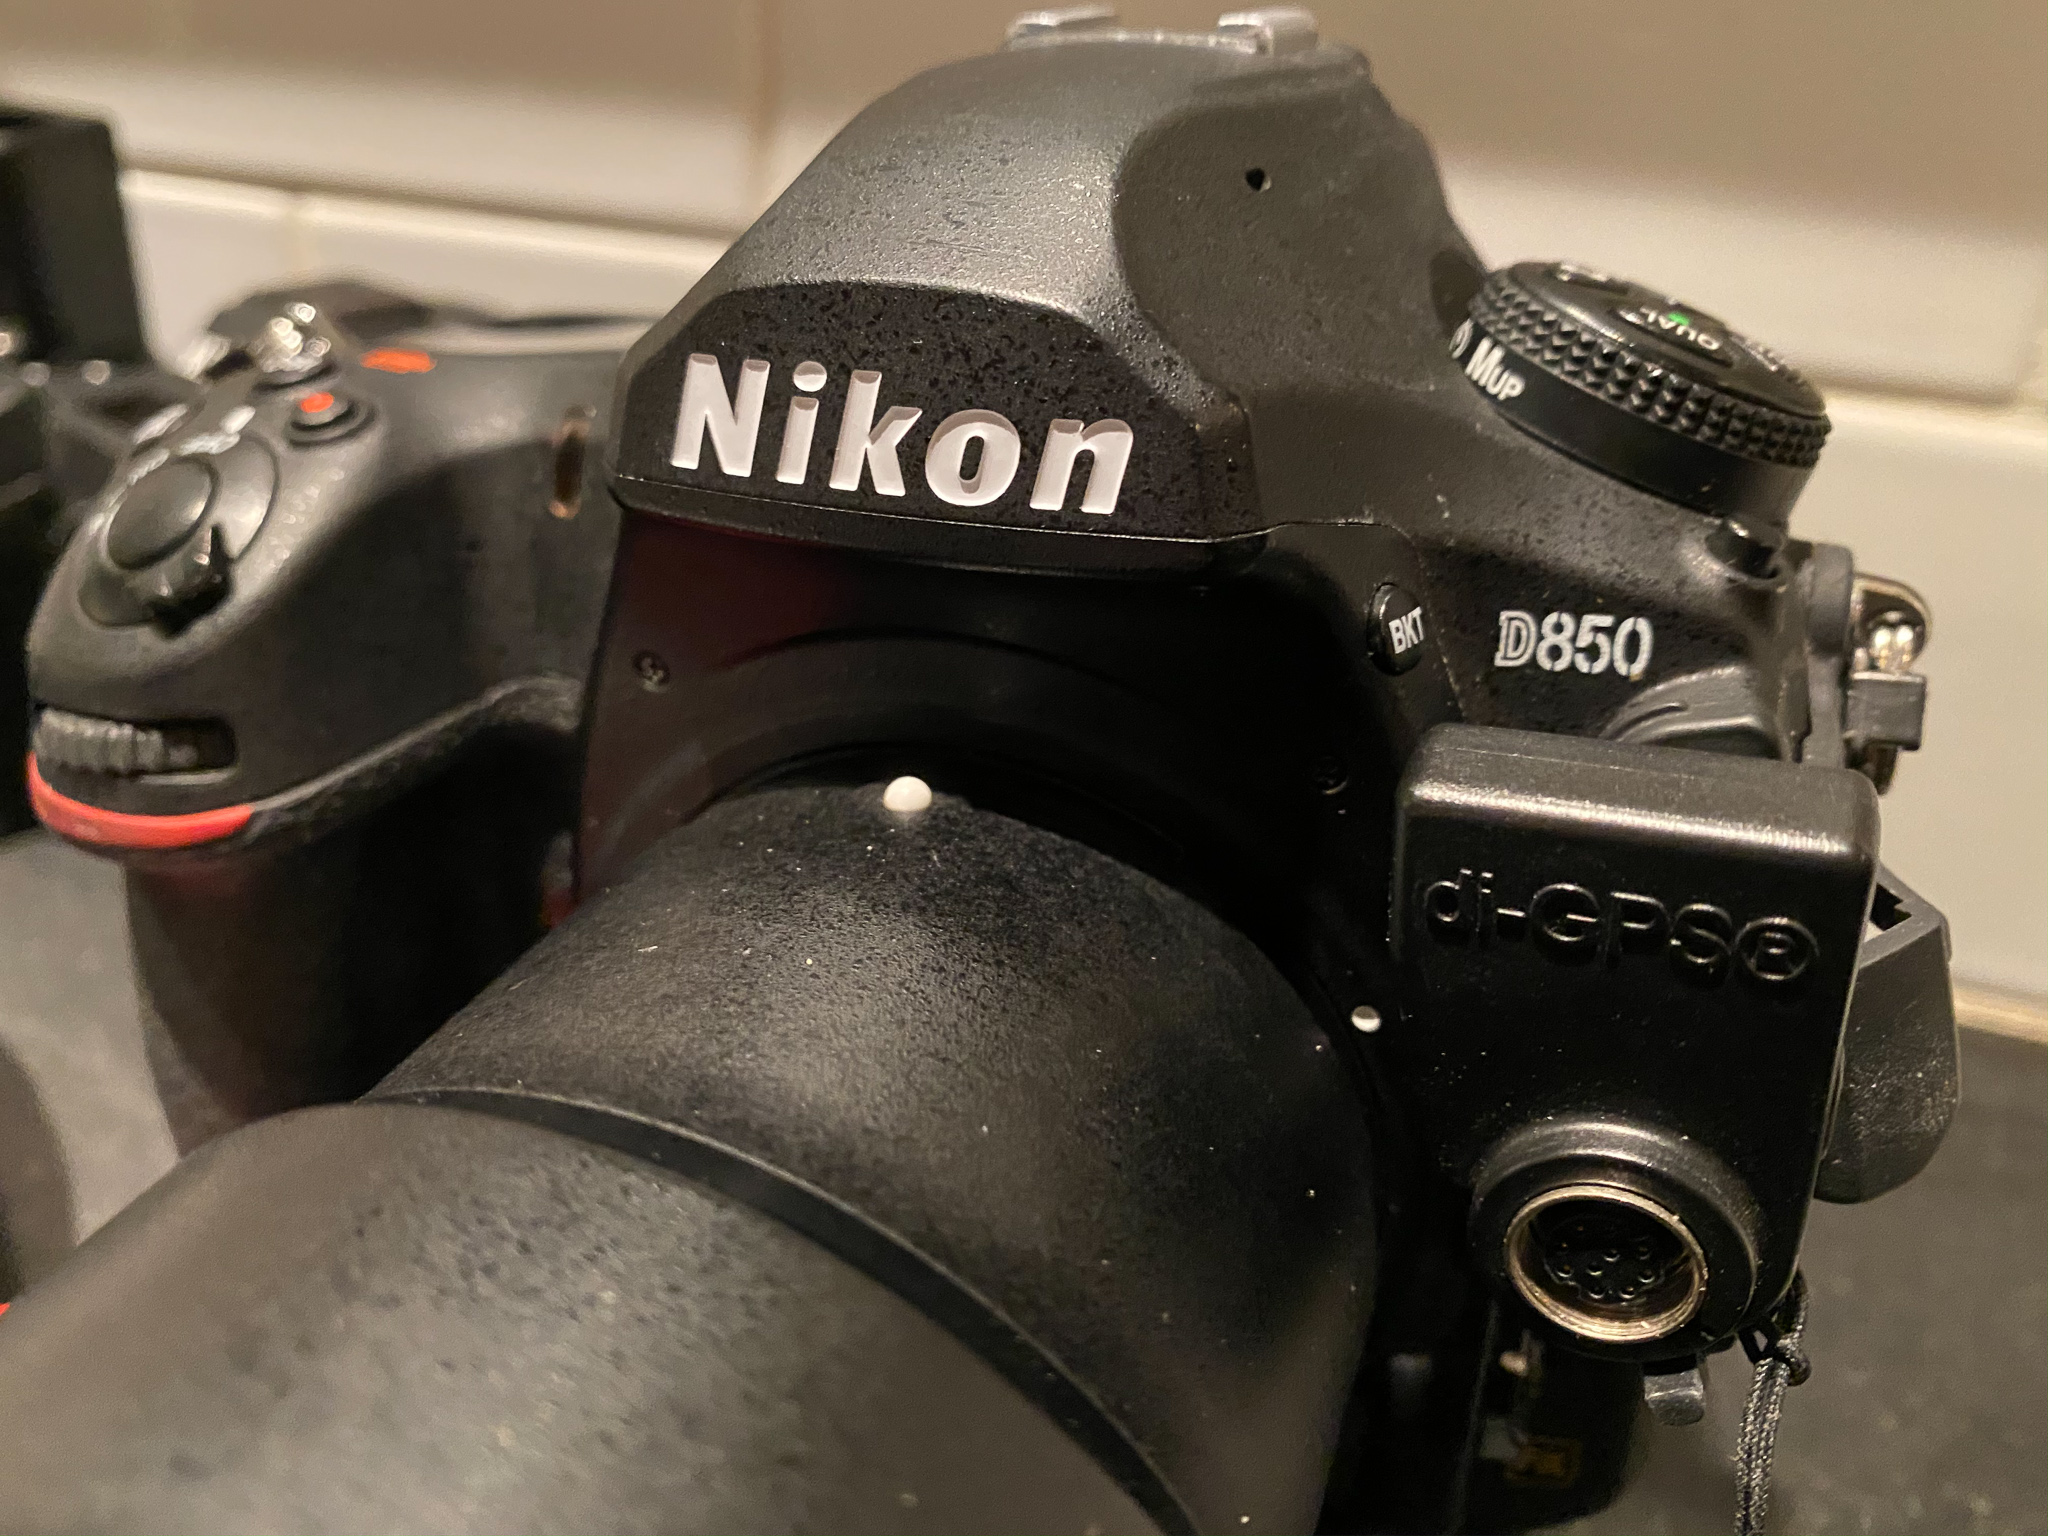 GPS receiver on a Nikon D850 camera